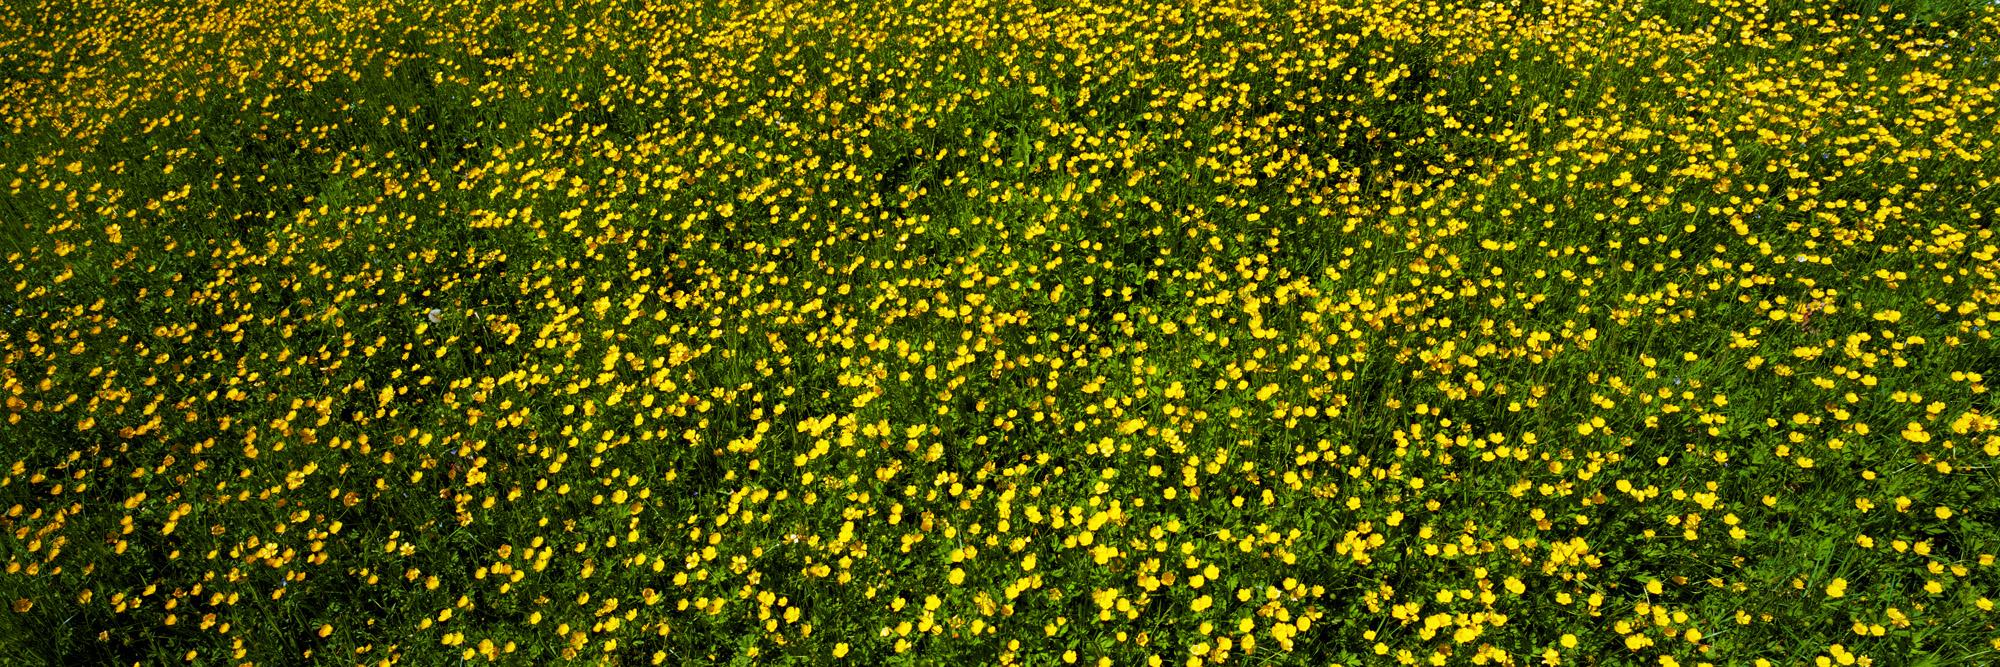 Brachland, Landschaft, Natur, analoge Fotografie, Großformat, Panoramafotografie, Markus Bollen, 6x17, grün, Leben, Wachstum, Frieden, Ruhe, Butterblumen, Wiese, Rasen